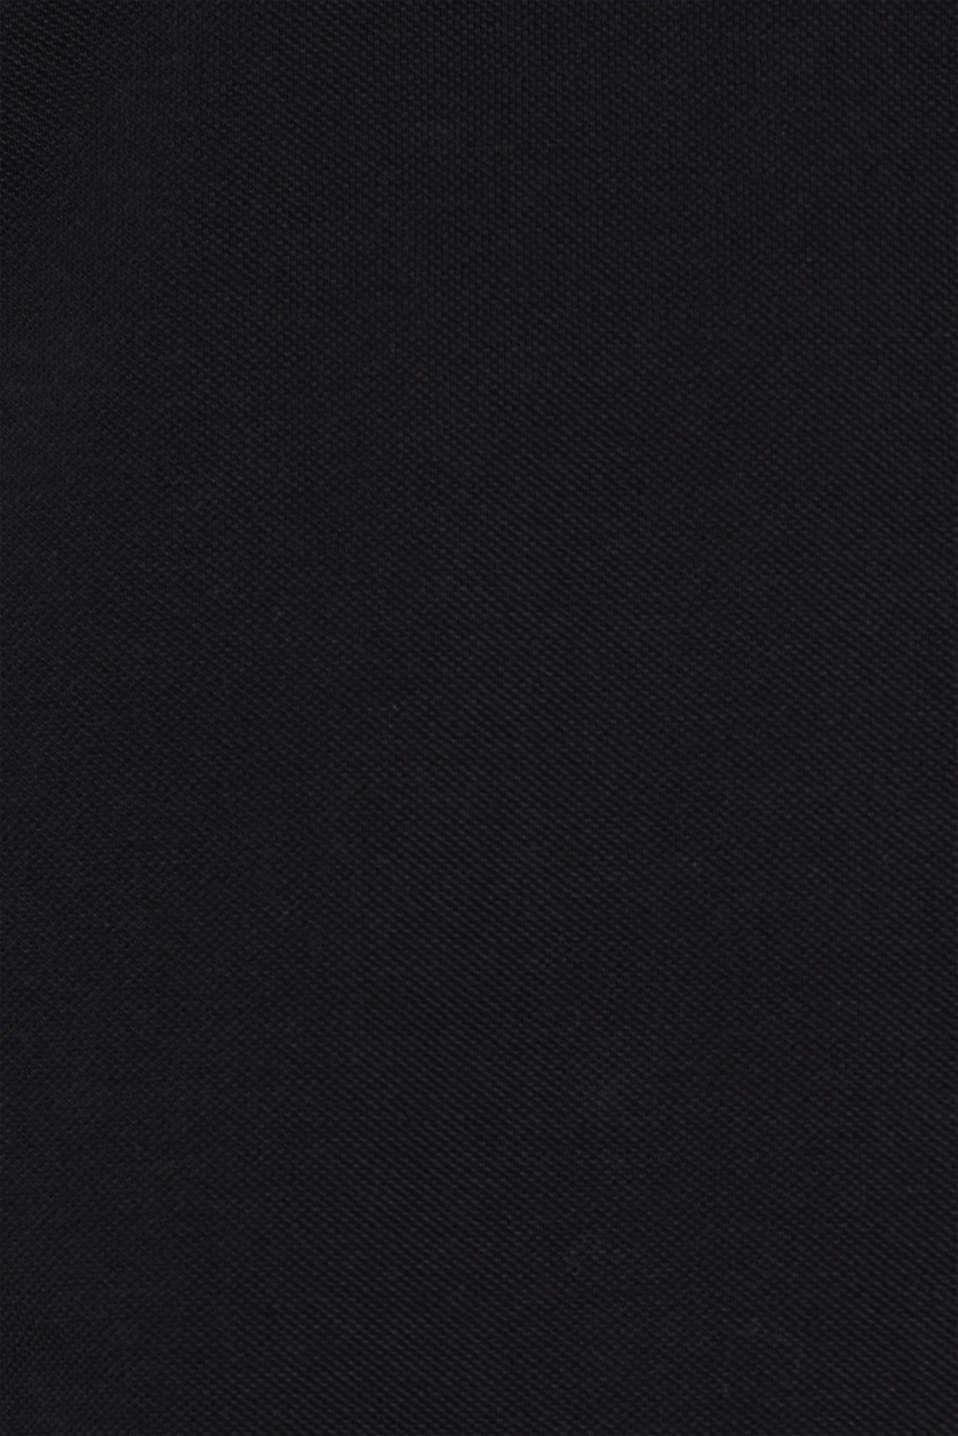 Piqué polo shirt made of Pima cotton, BLACK, detail image number 4